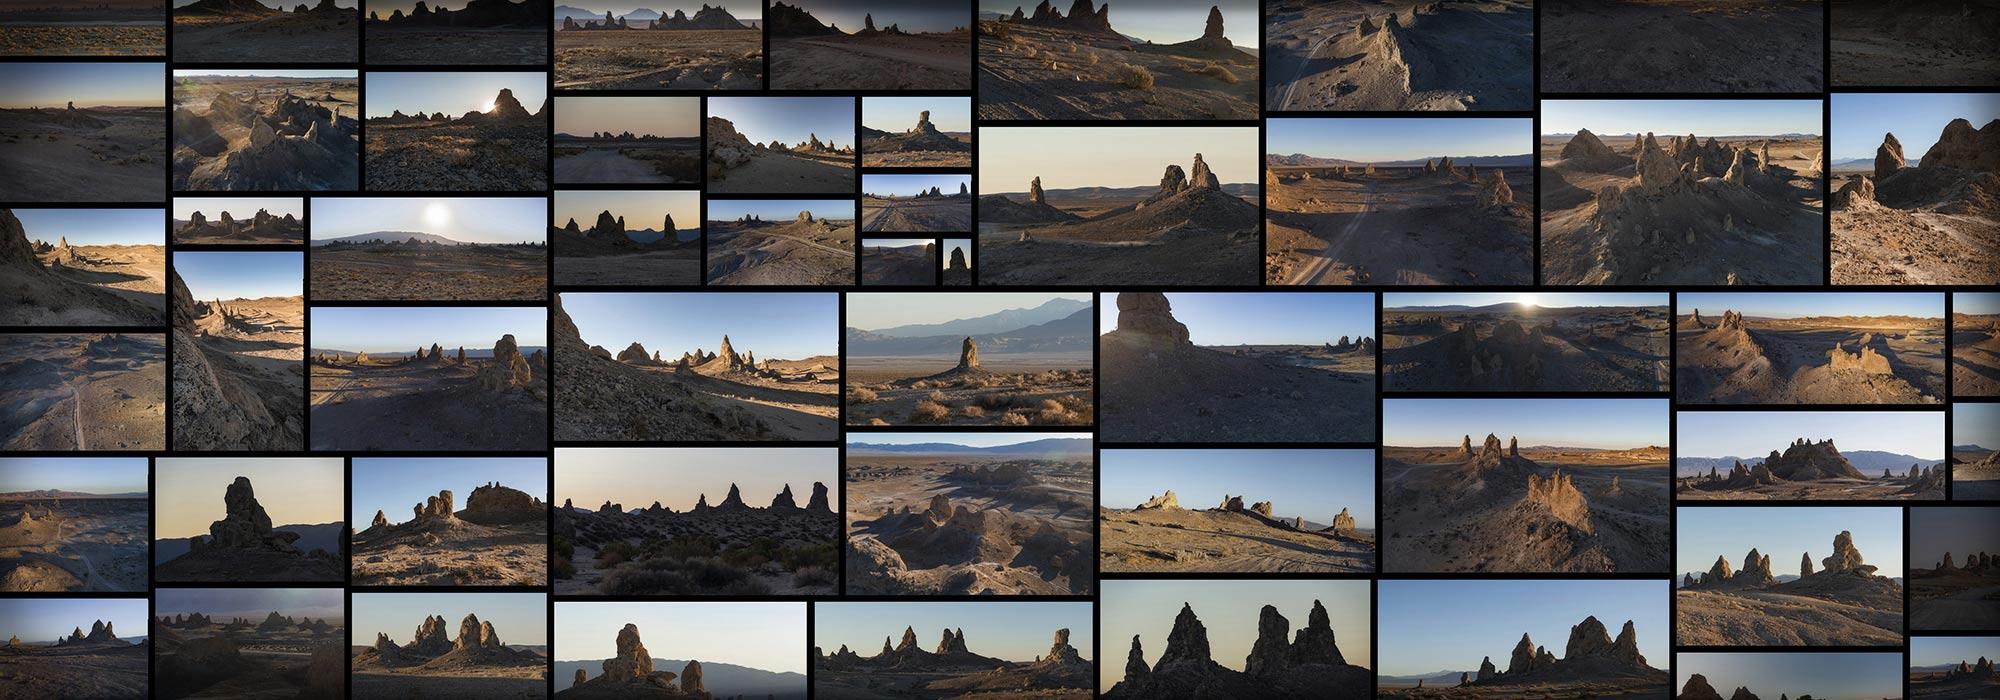 Trona Pinnacles Desert Alien Rock Formation Spires